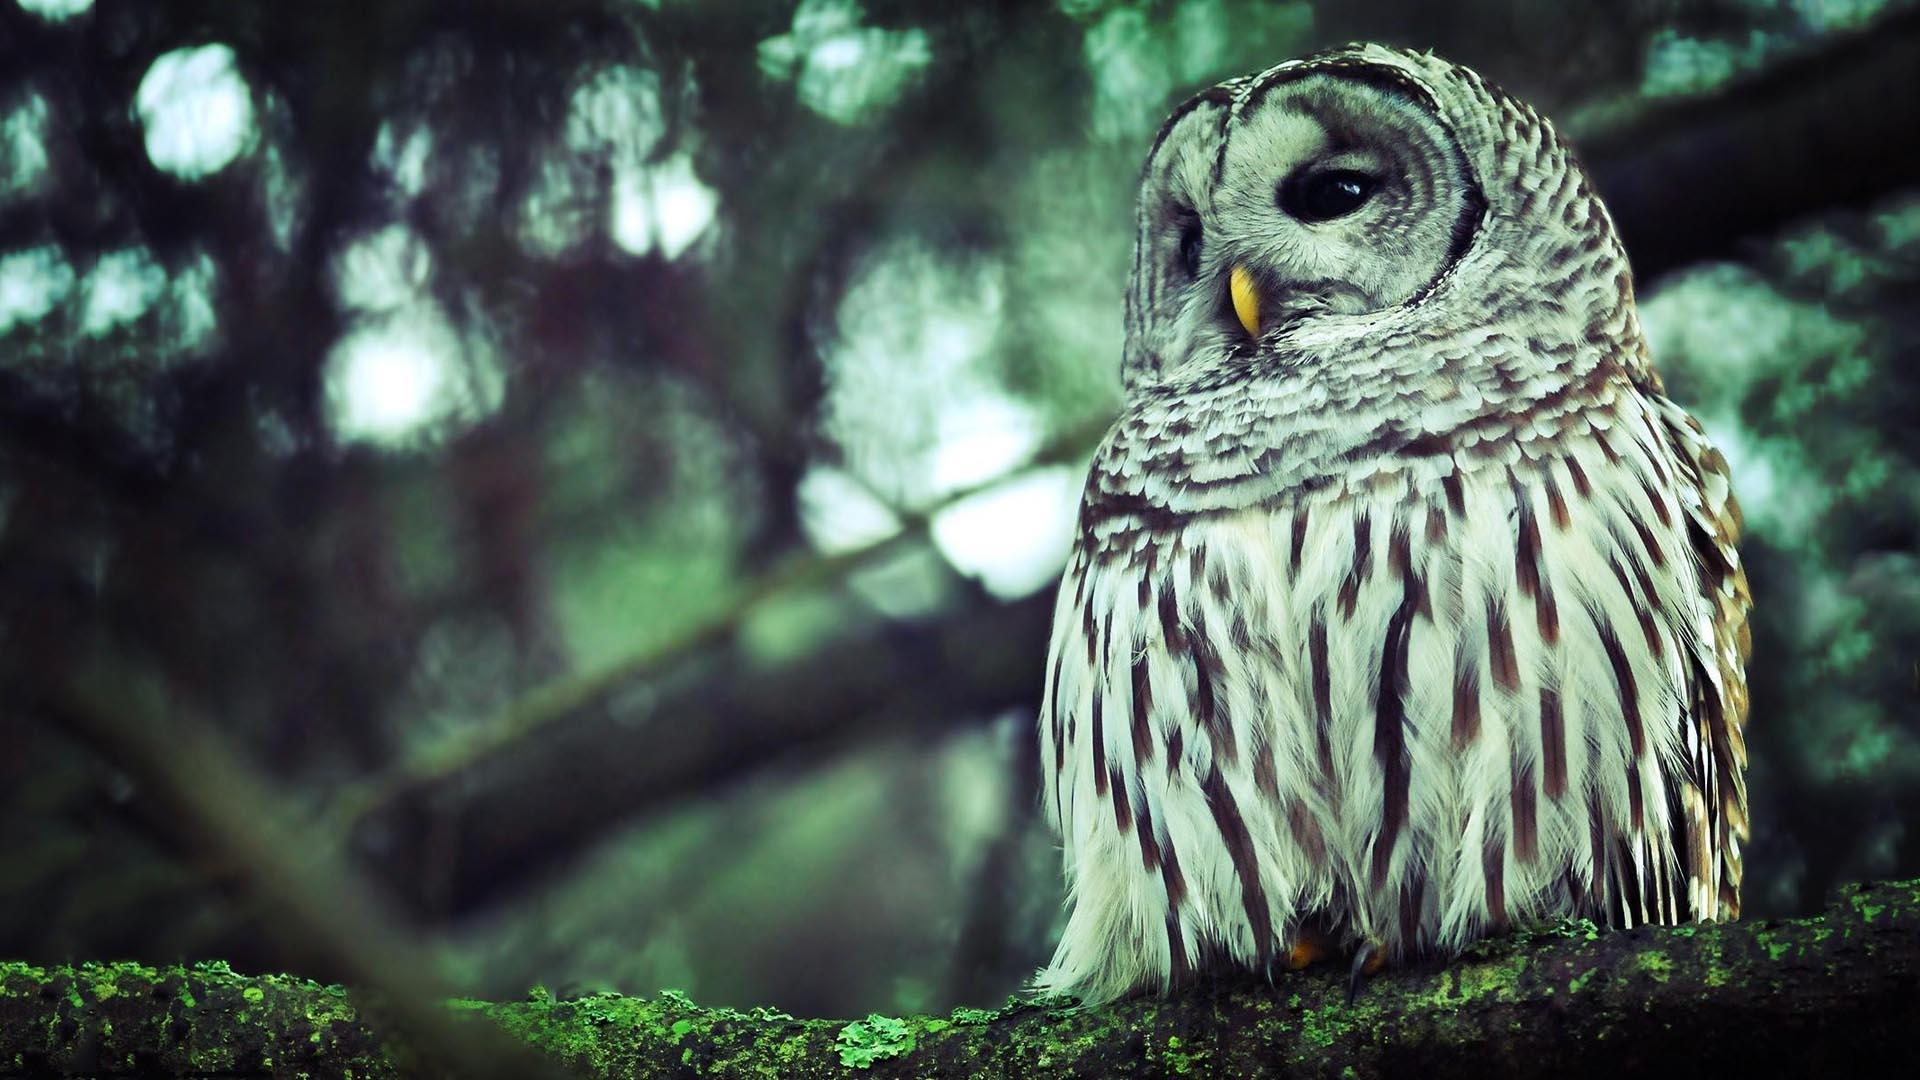 Owl wallpaper 1920x1080 58865